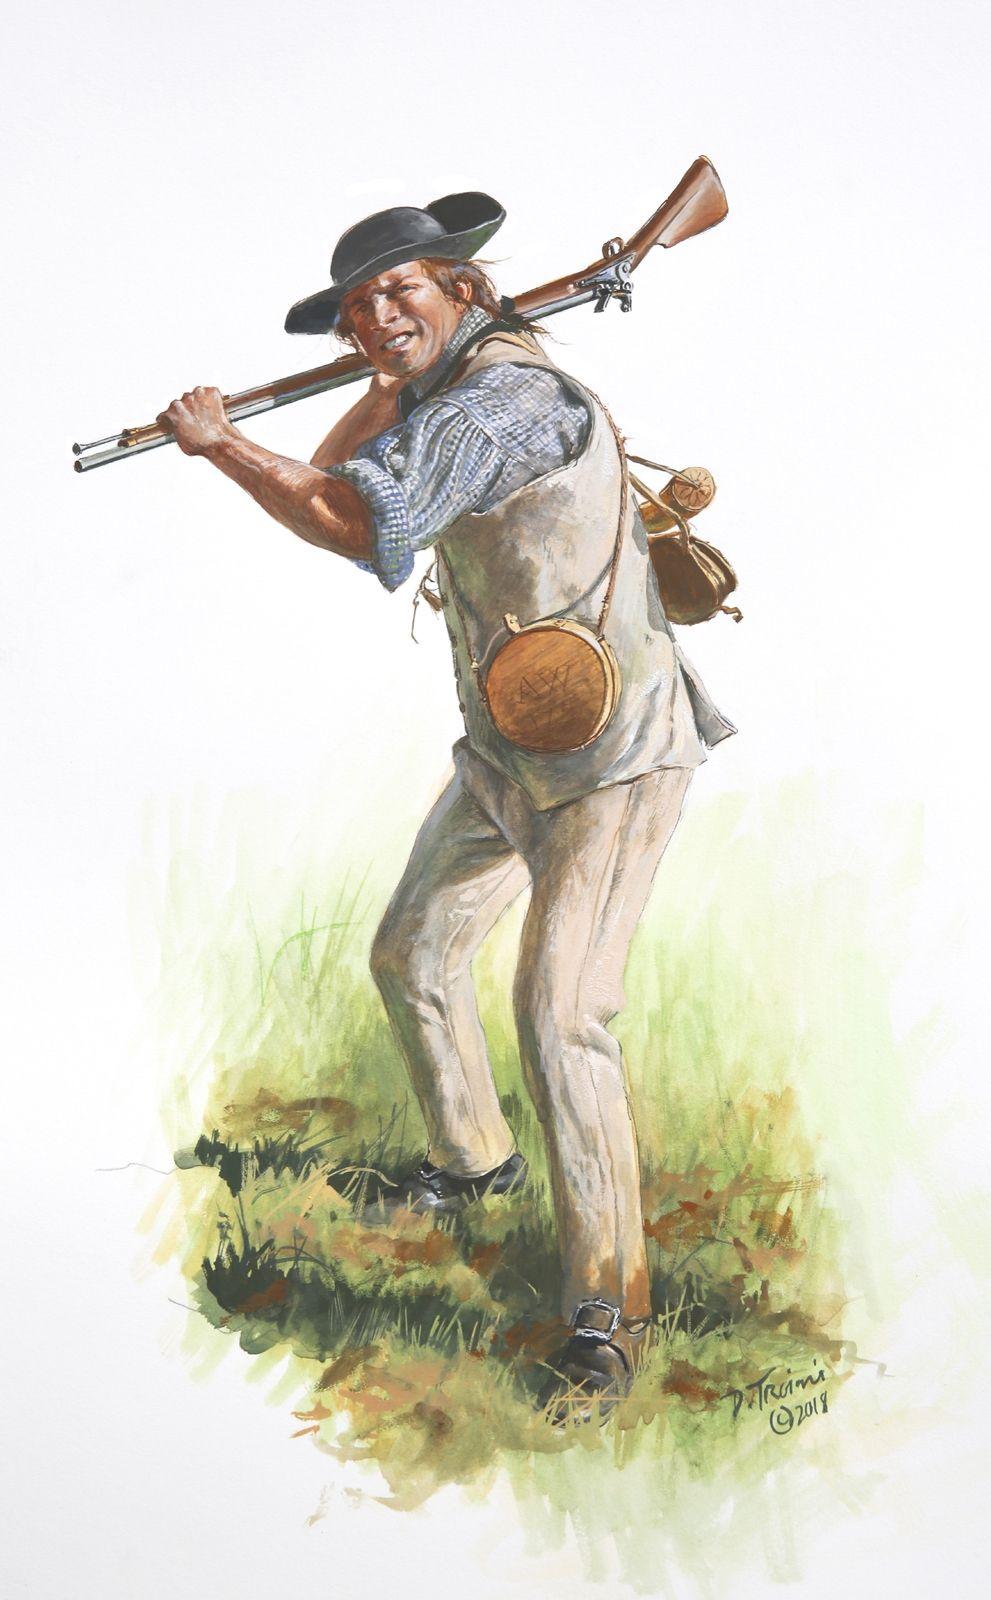 Pin by David DiCarlo on Continentals (American Revolution